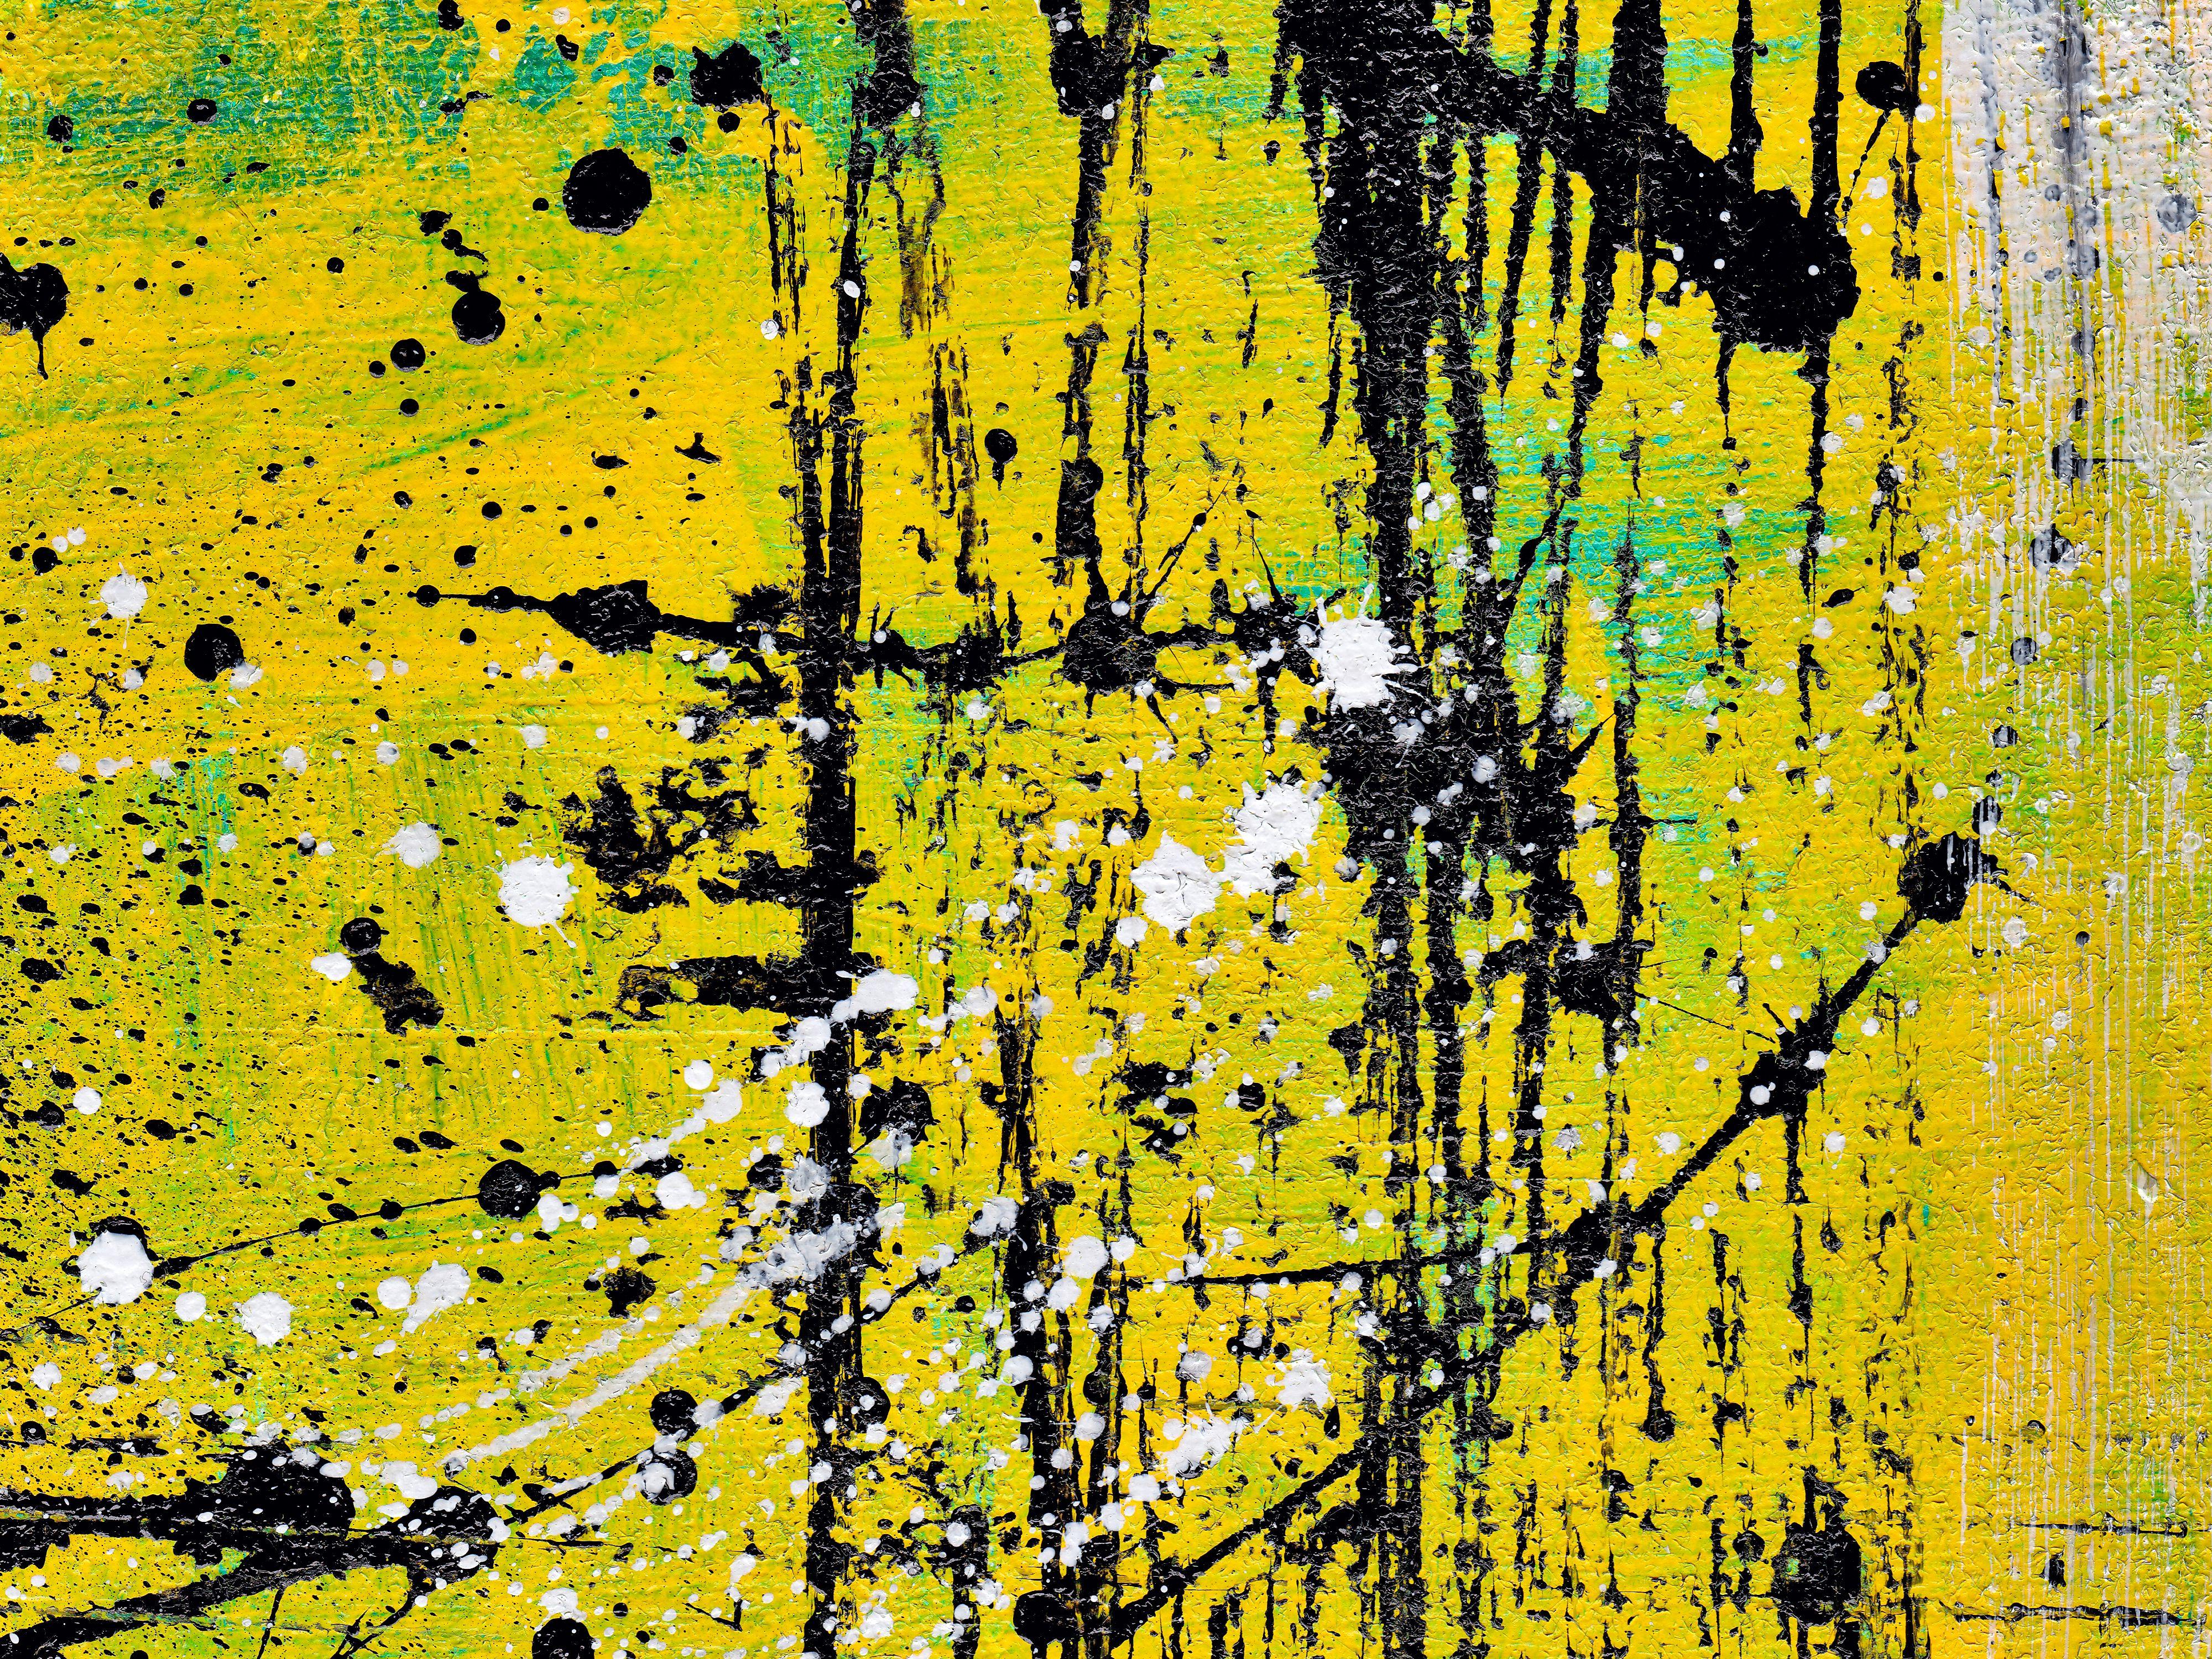 6 Abstract Acrylic Yellow Orange Black Background Jpg